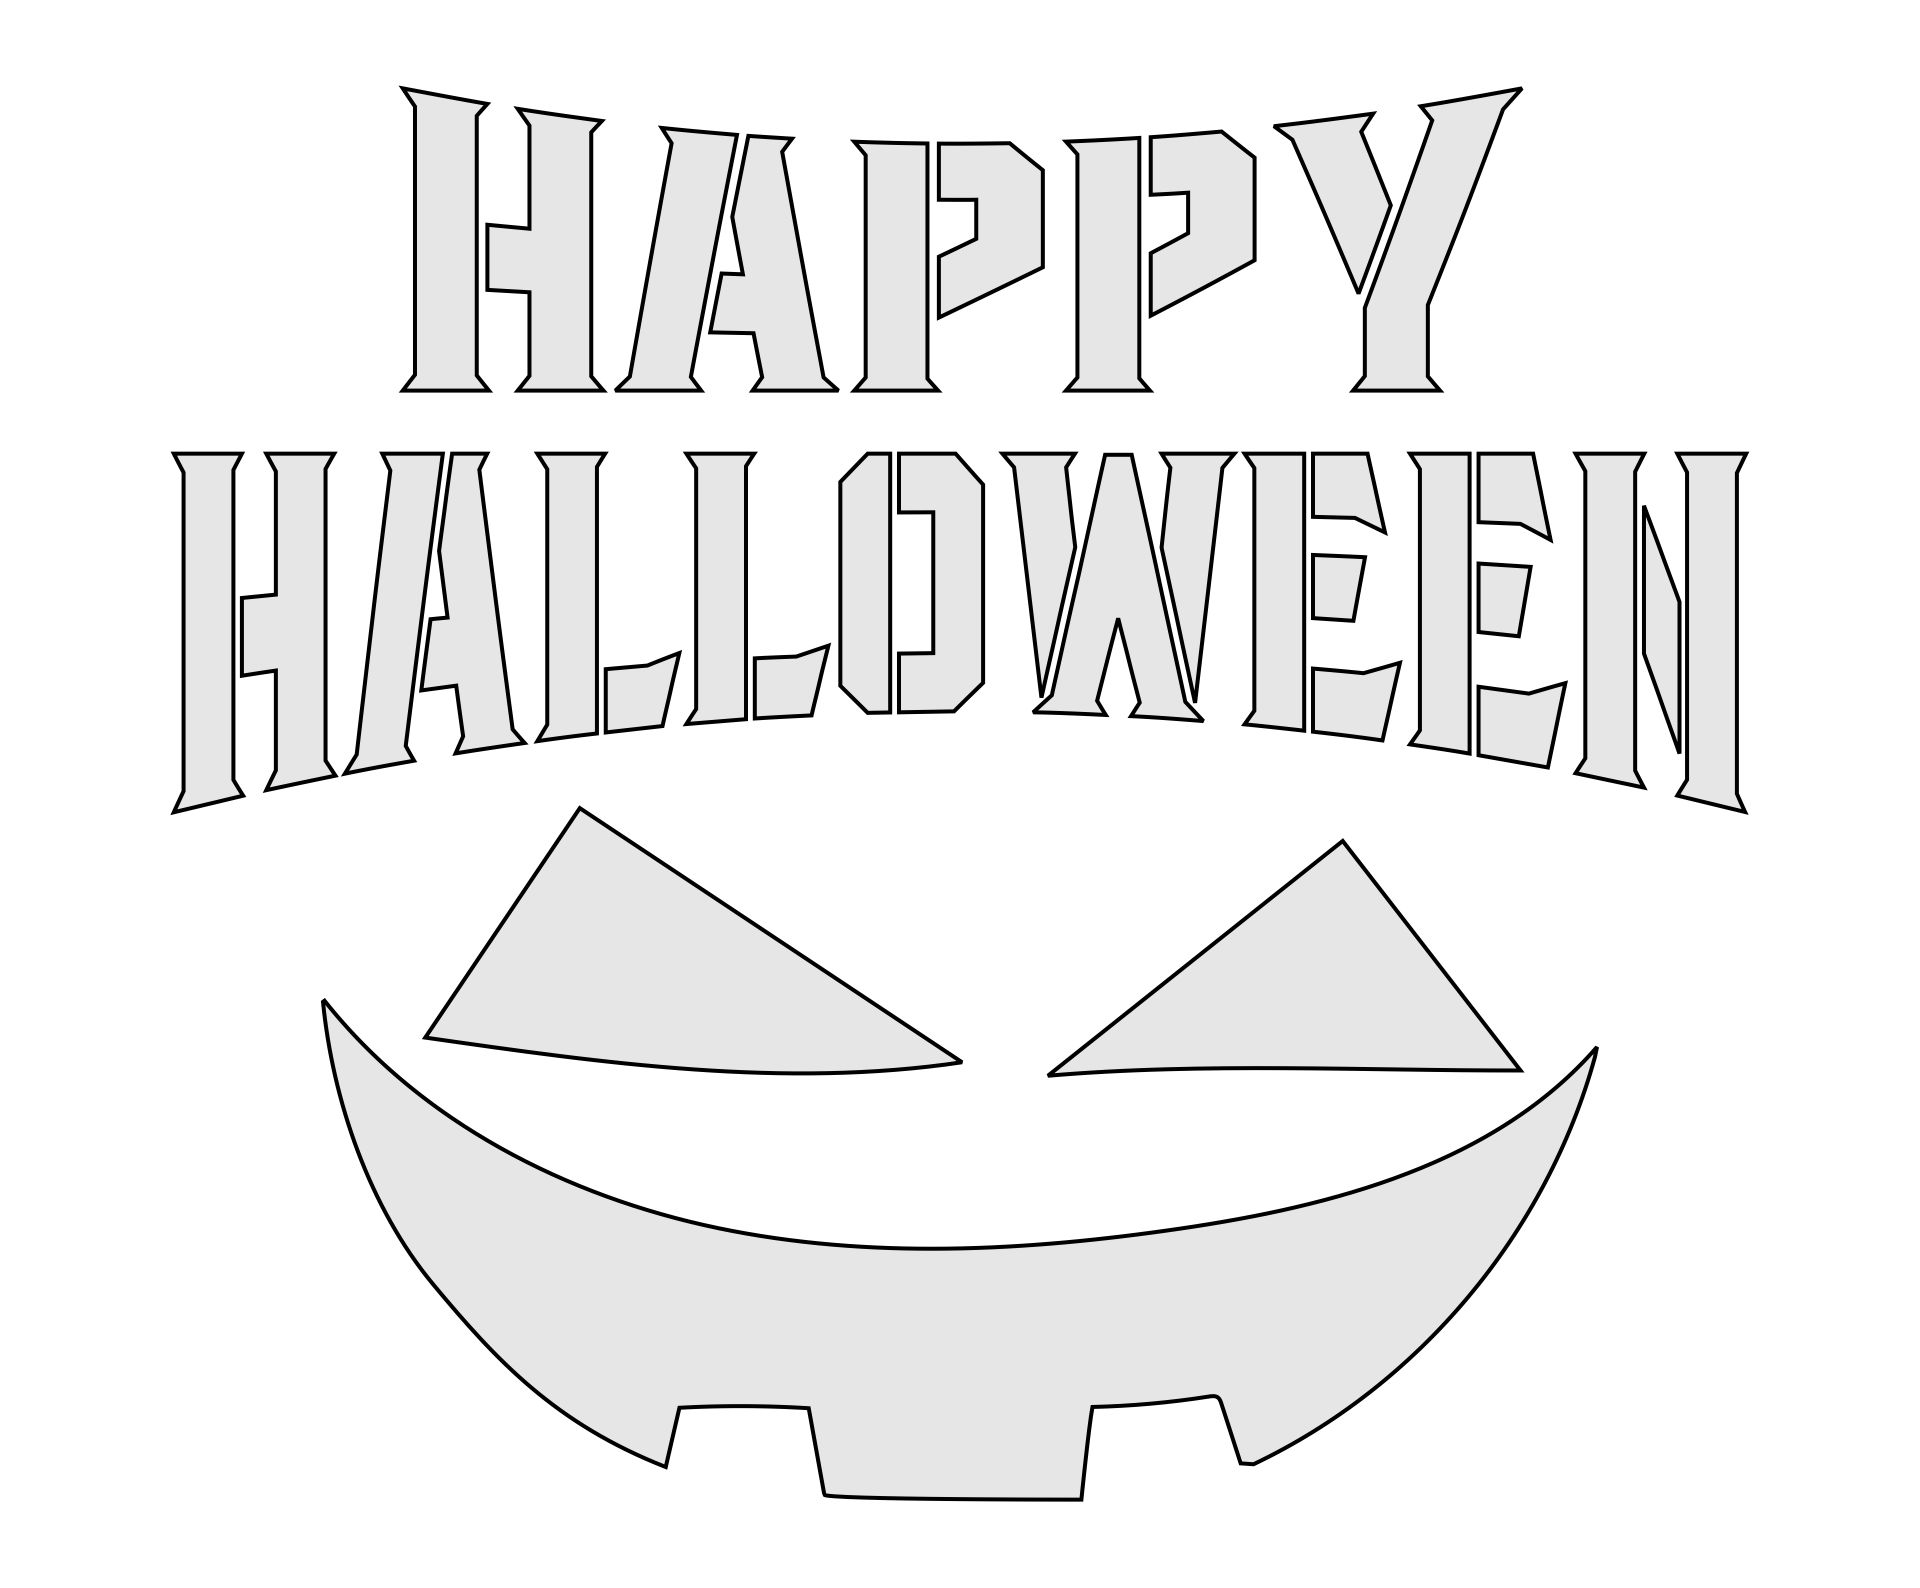 Happy Halloween Cut Out Pumpkin Jack